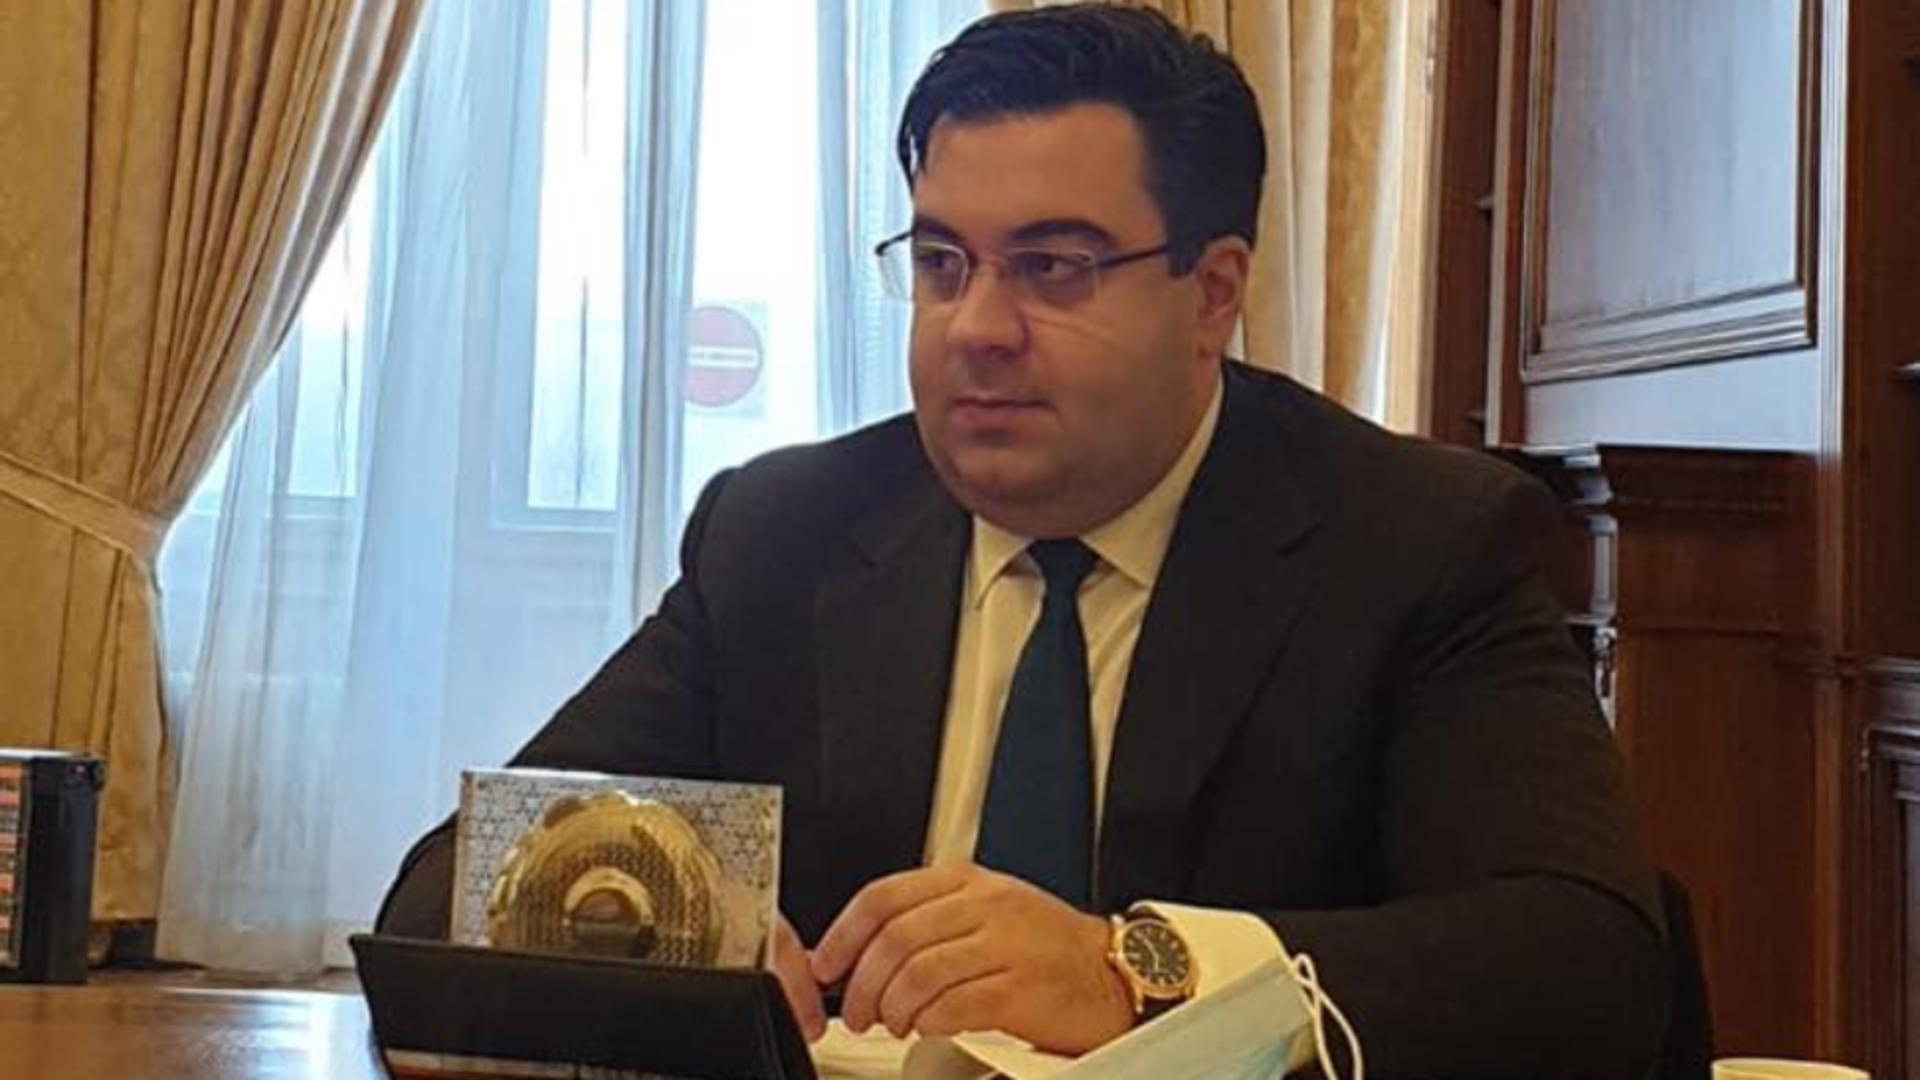 Răzvan Cuc, senator PSD Foto: Facebook.com